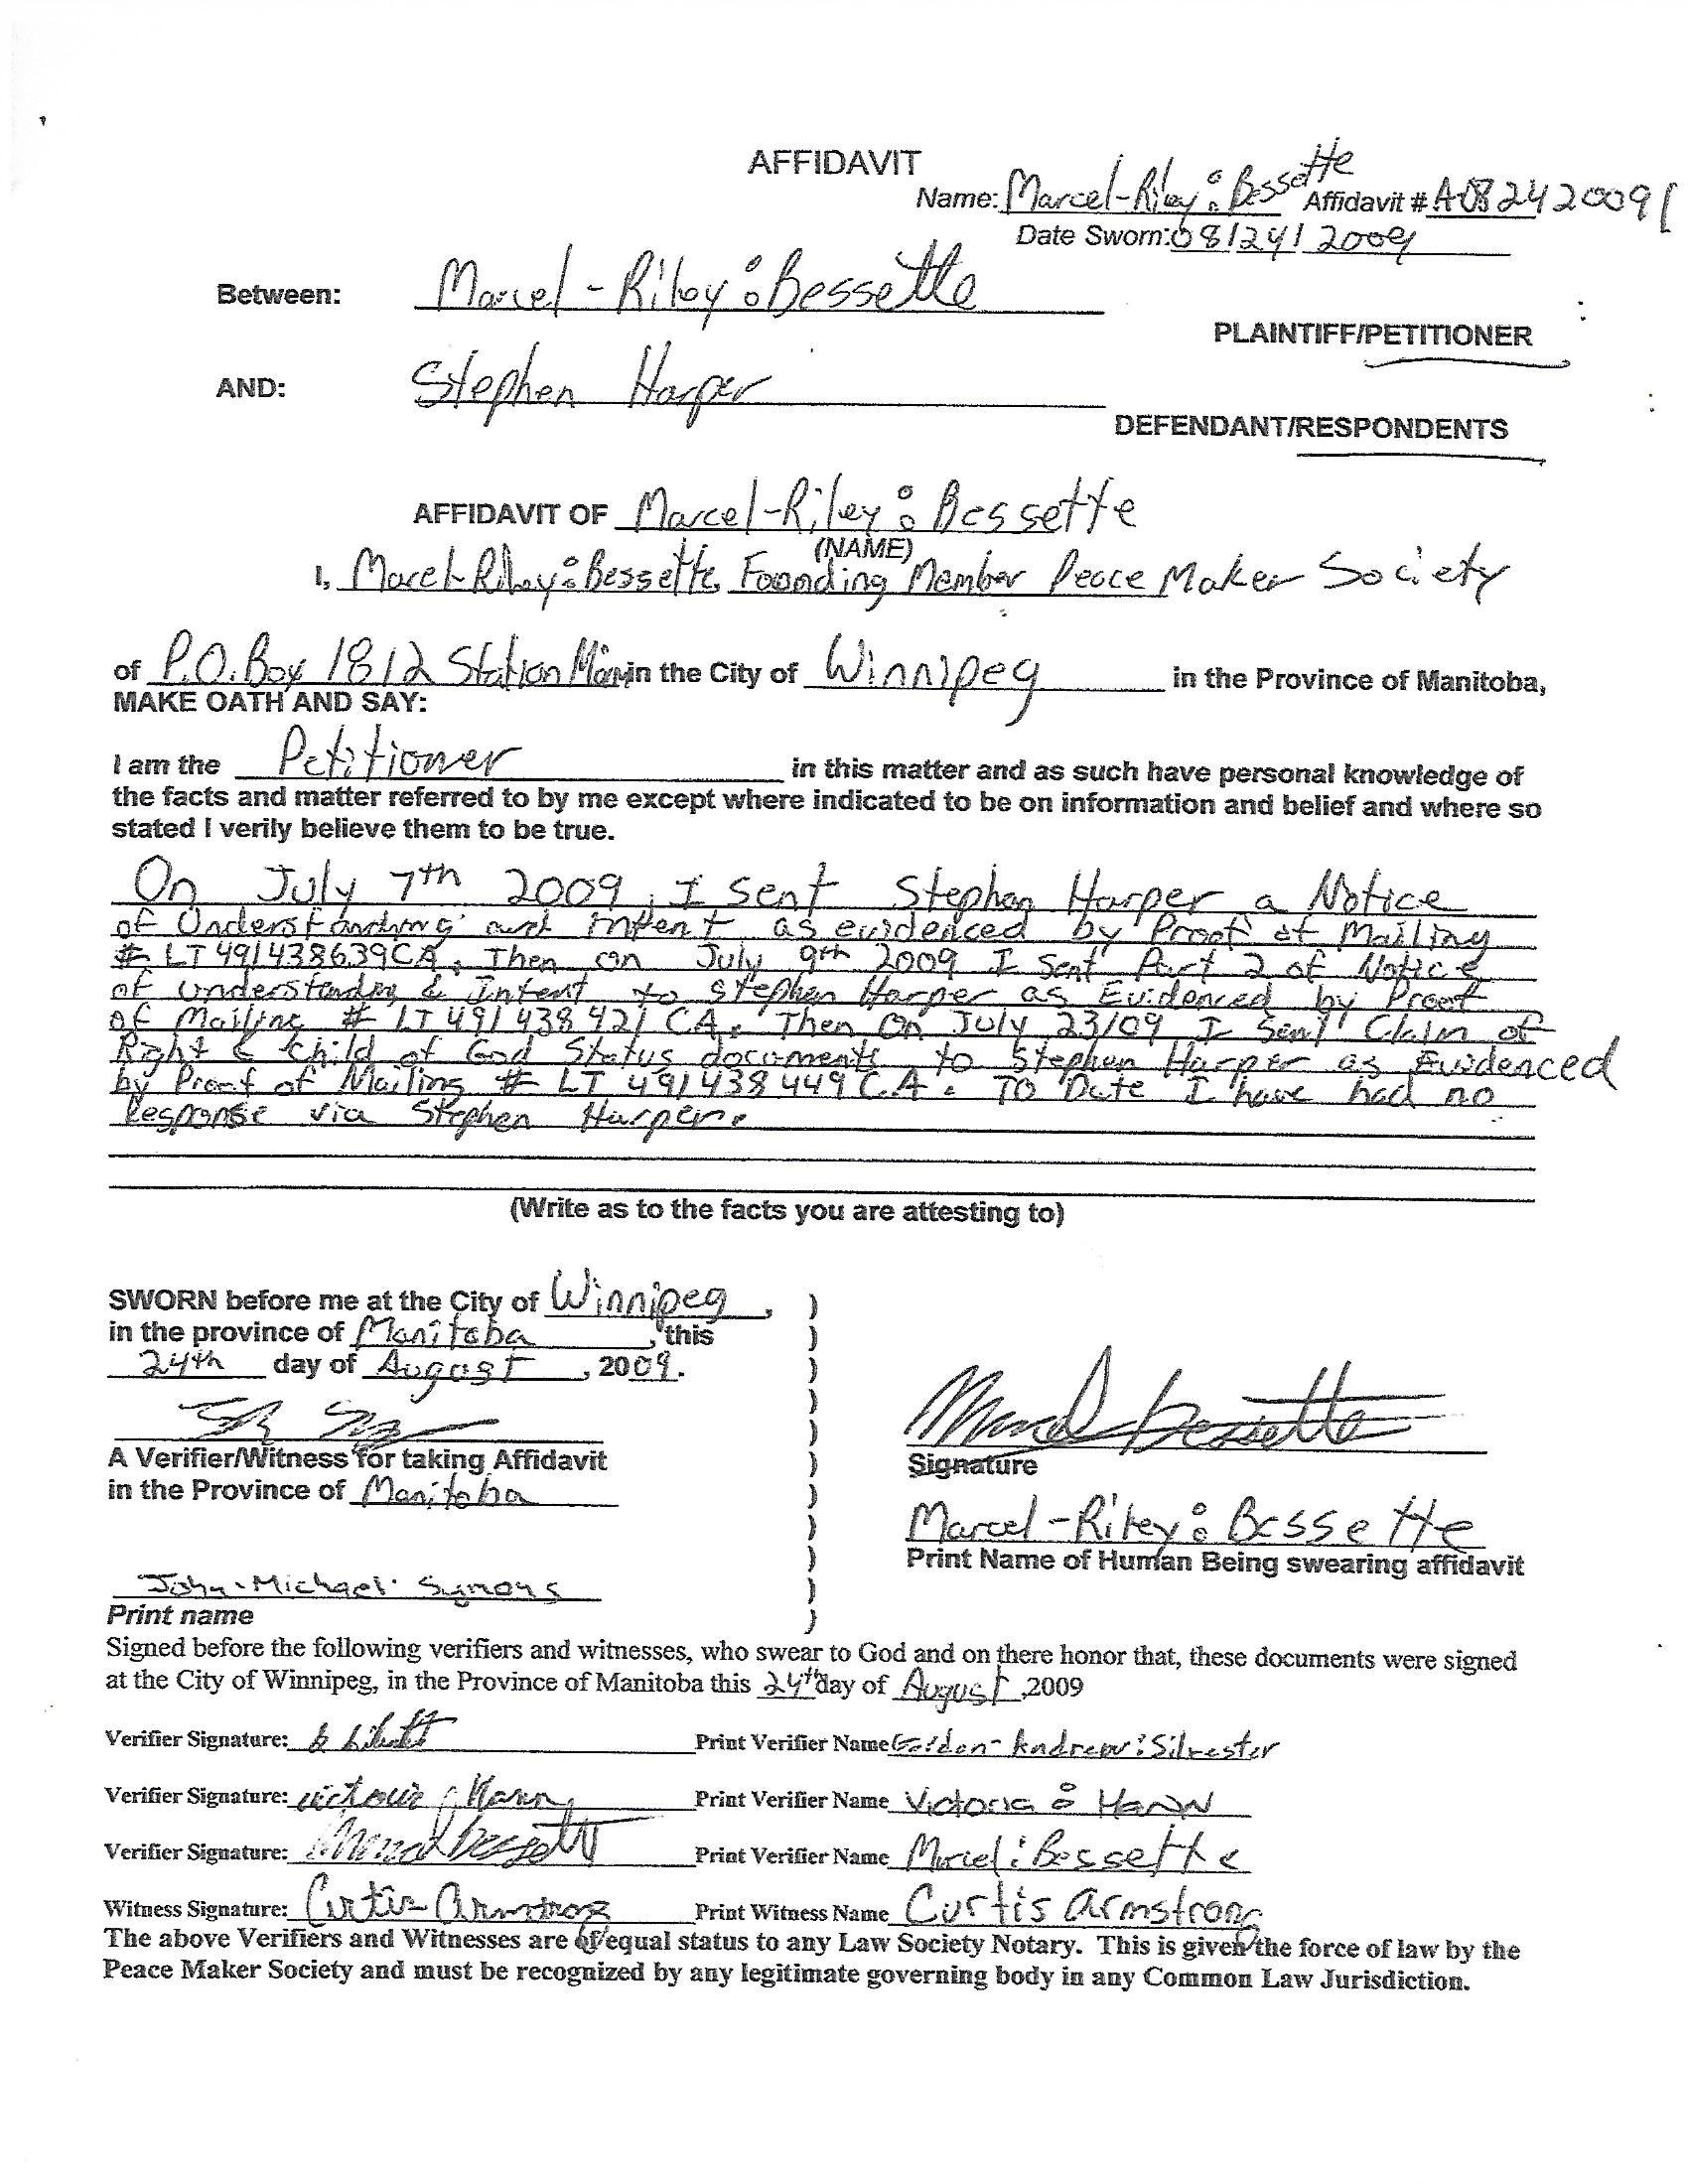 Affidavitt Of Service